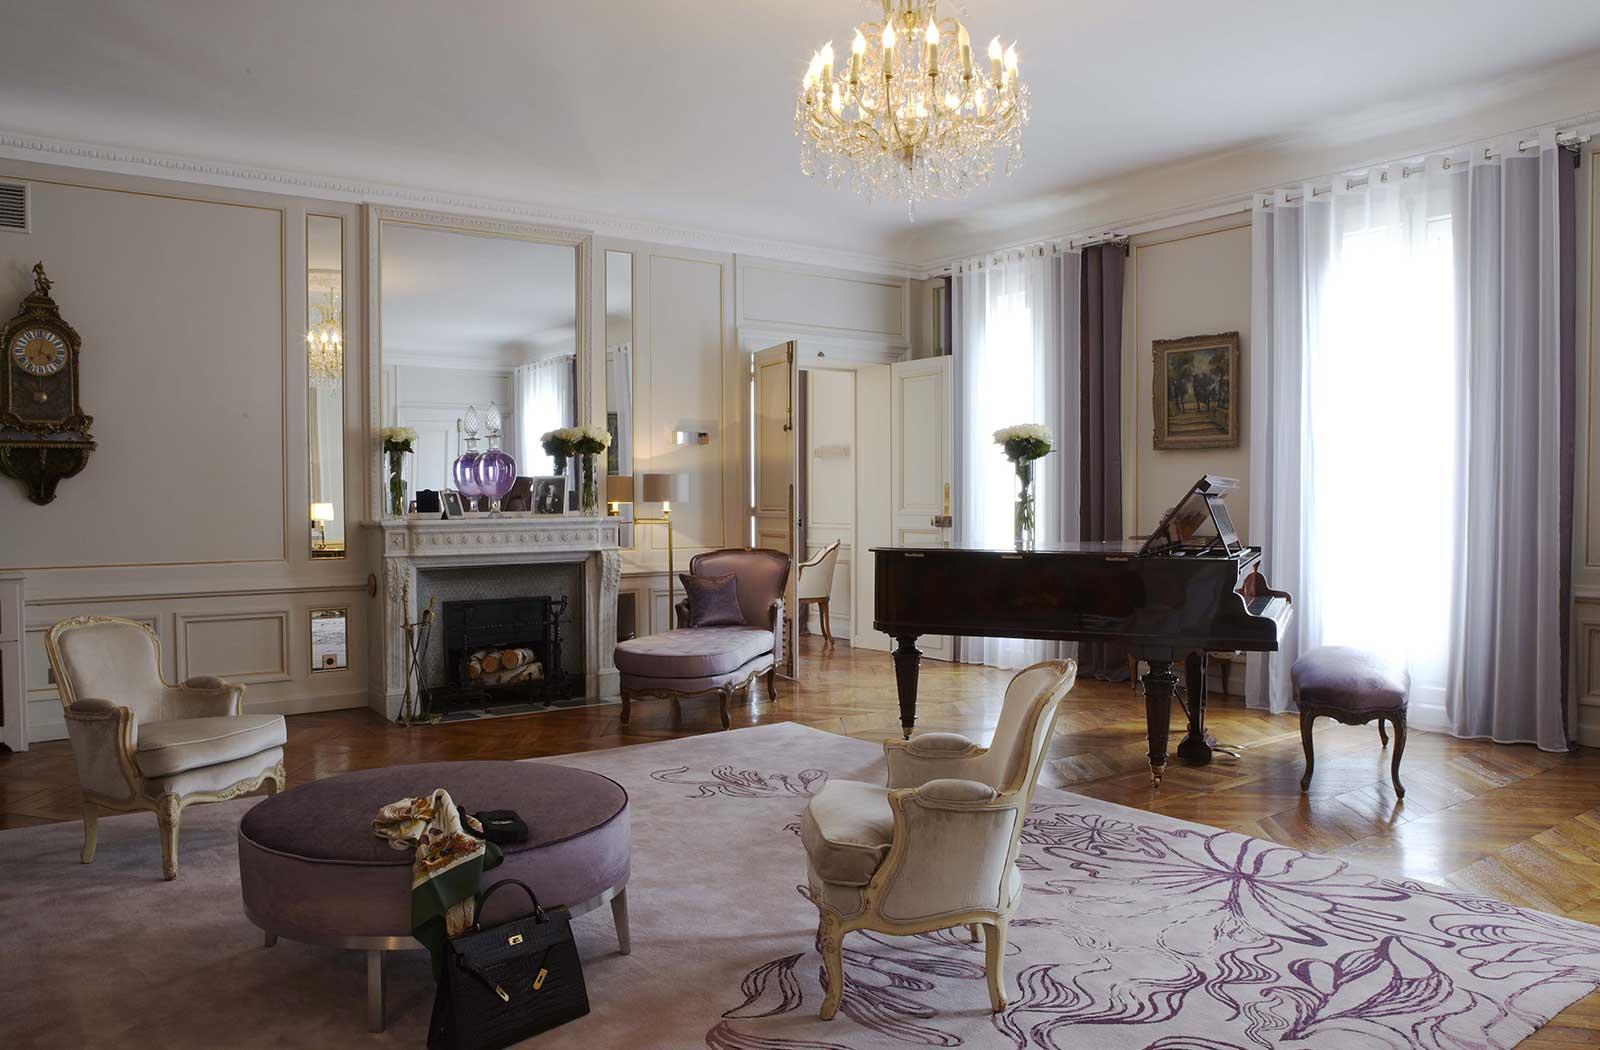 /images/hotel_lancaster_paris_6.jpg